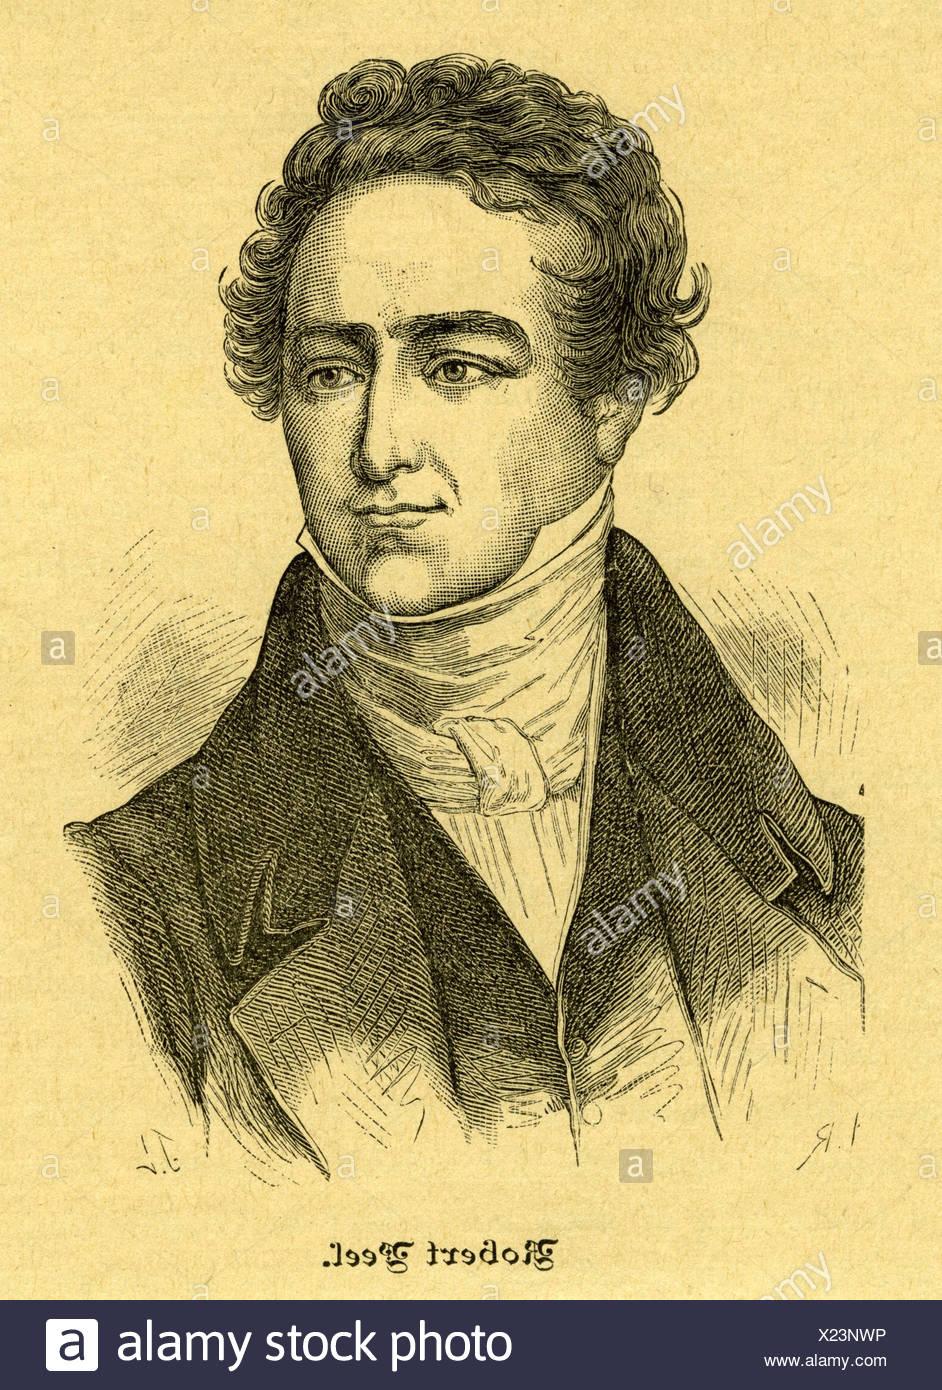 Peel, Robert, 5.2.1788 - 2.7.1850, British politician, Prime Minister 1834 - 1835 and 1841 - 1845, portrait, contemporay engravi - Stock Image